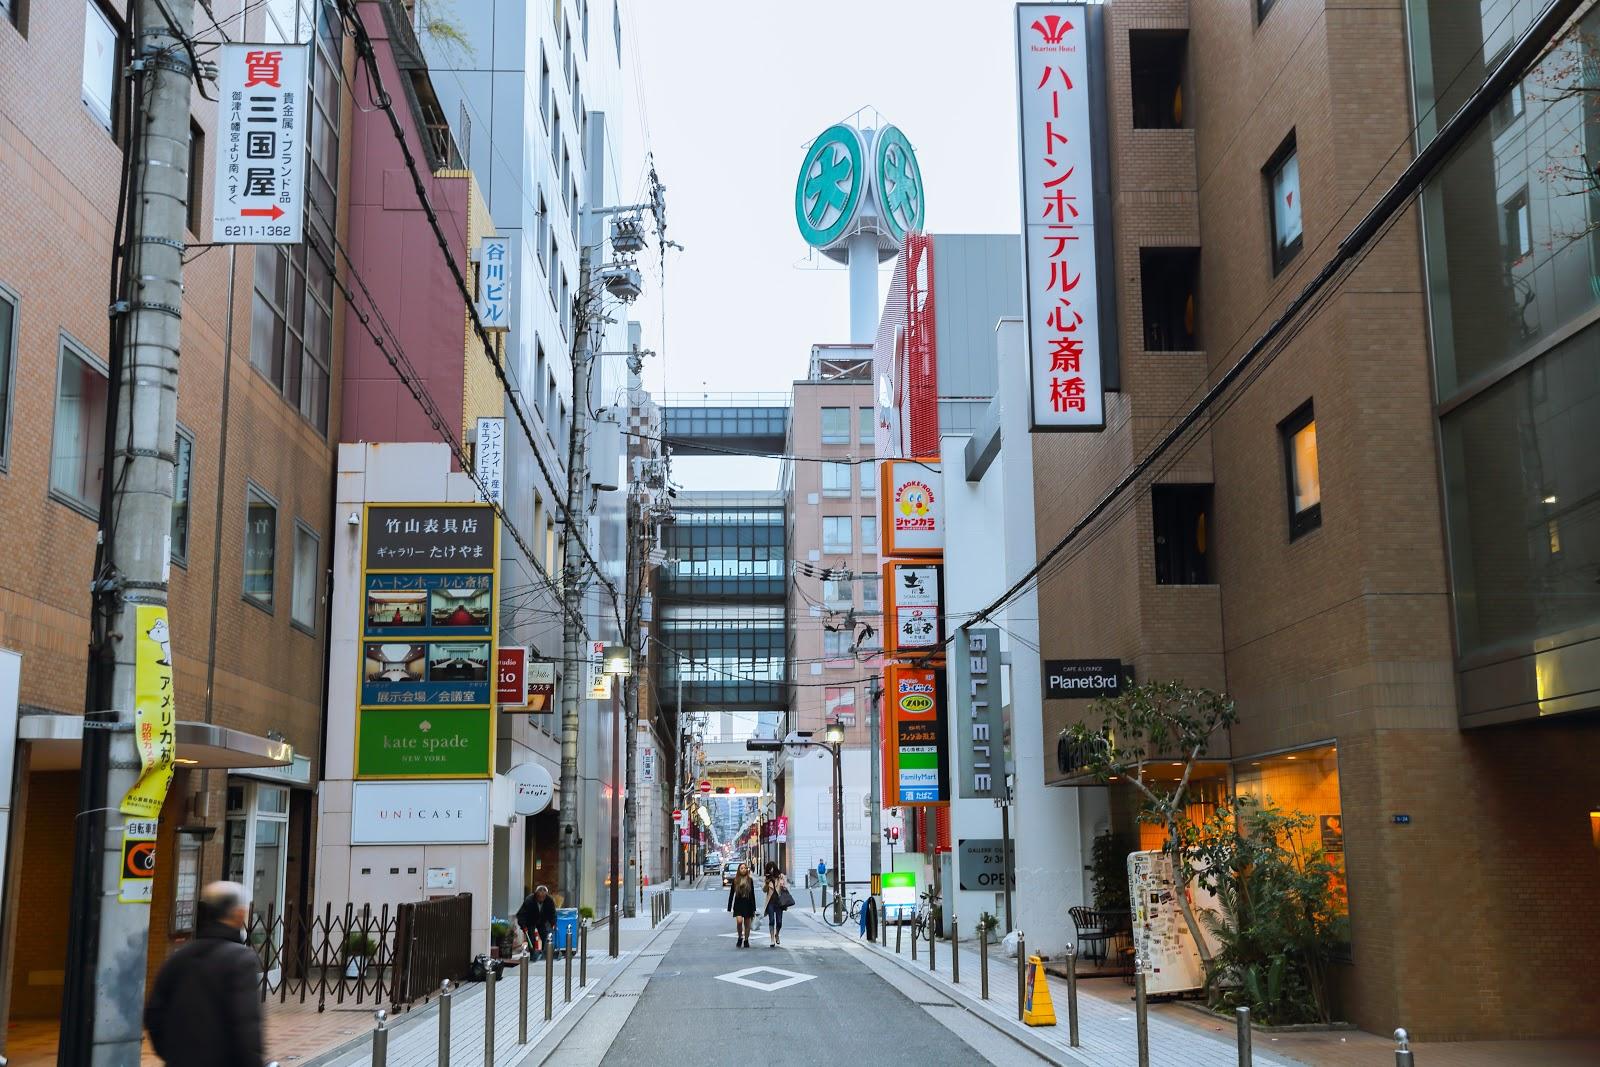 HEARTON HOTEL SHINSAIBASHI心齋橋哈頓飯店-第一次日本關西京阪奈自由行旅(四)